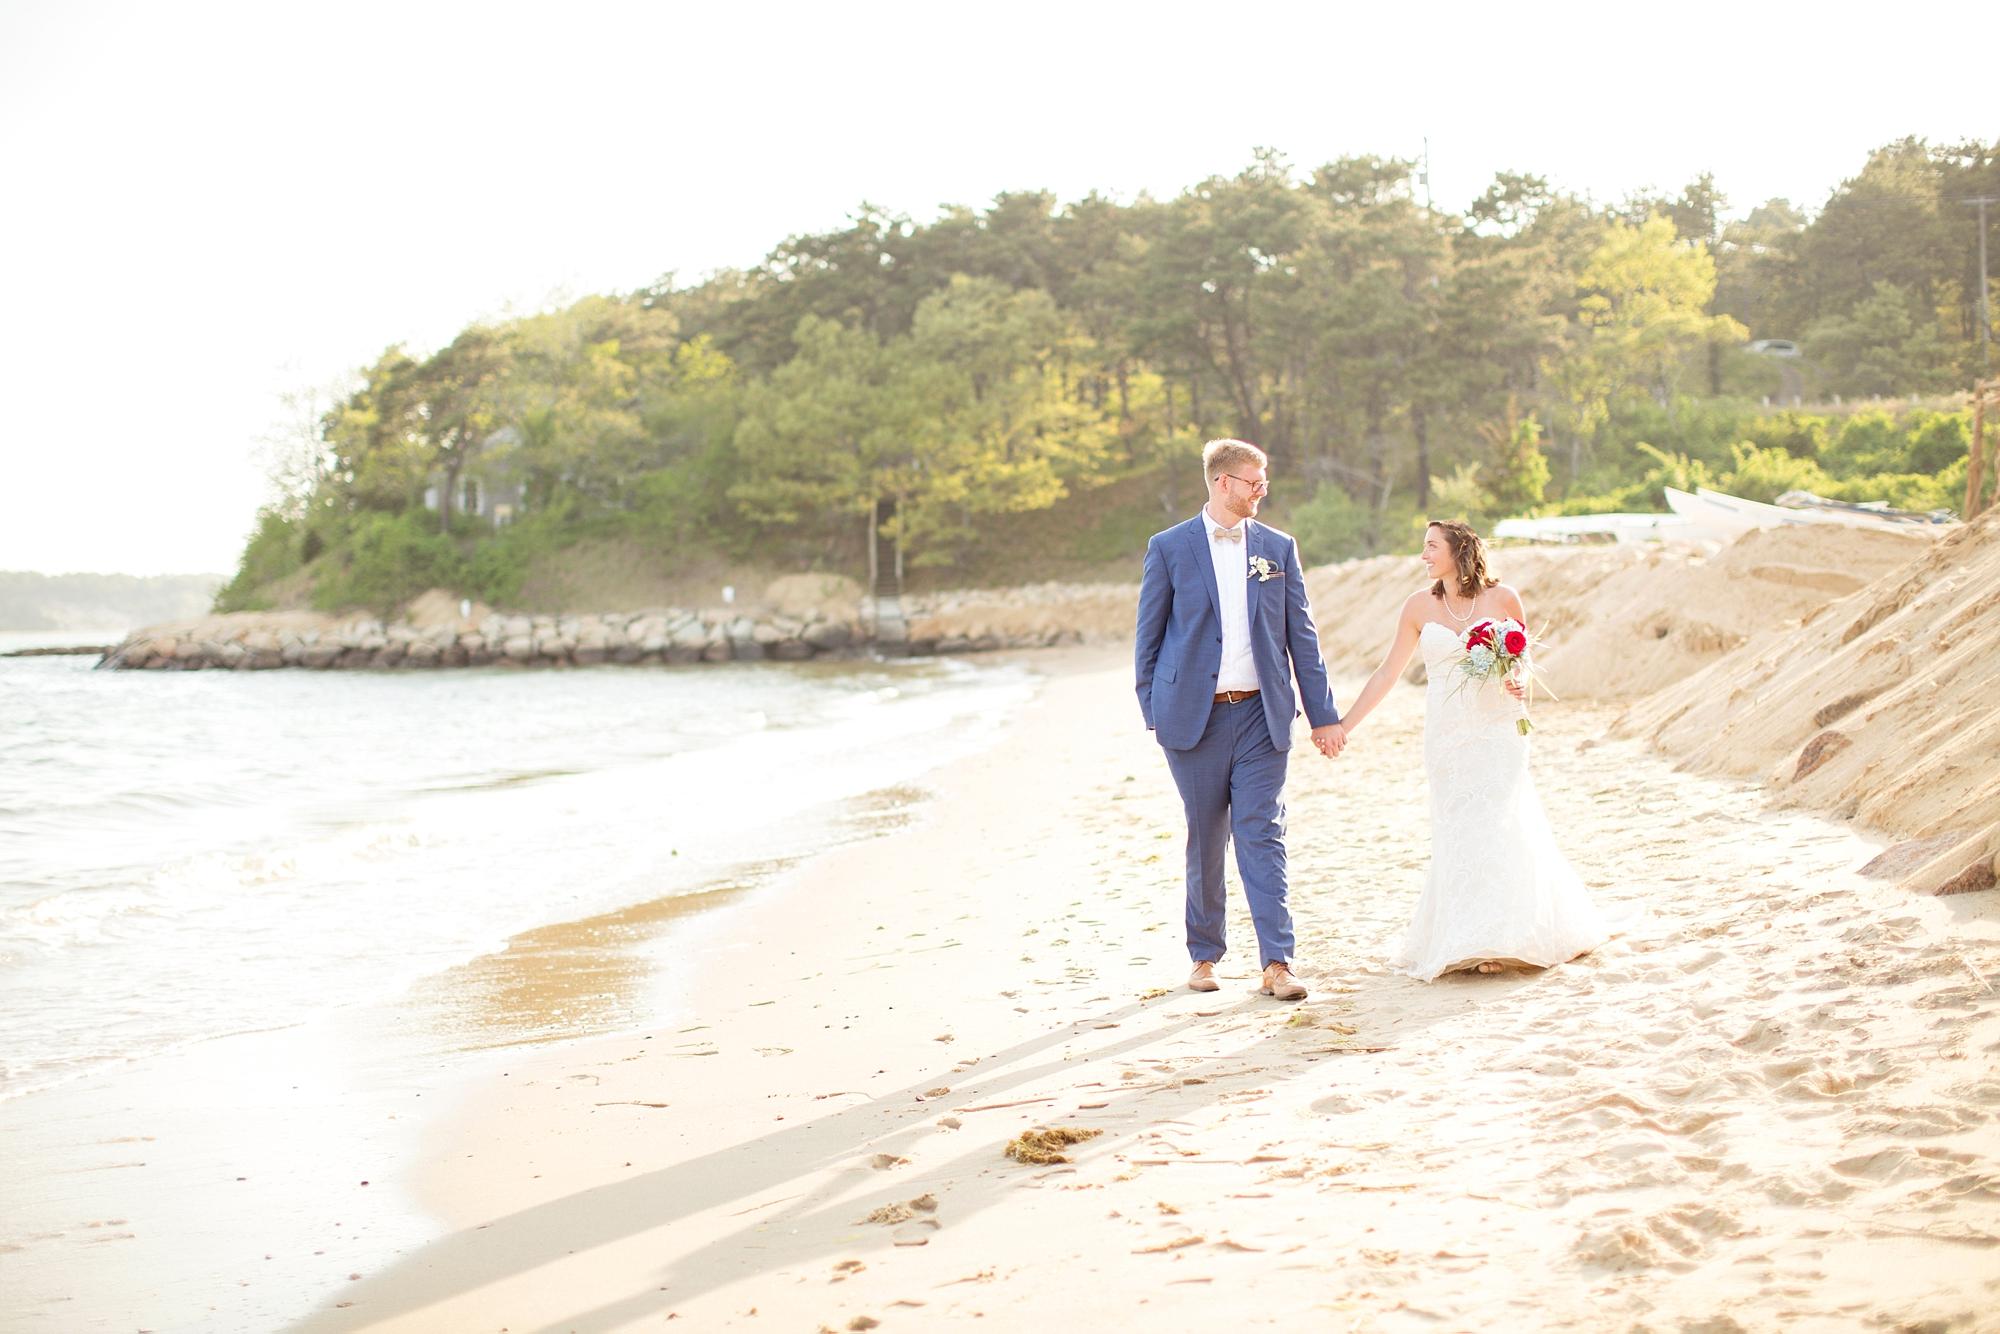 Goodman 3-Bride & Groom Portraits-877_anna grace photography wellfleet cape cod massachusetts destination wedding photographer Chequessett Yacht and Country Club wedding photo.jpg